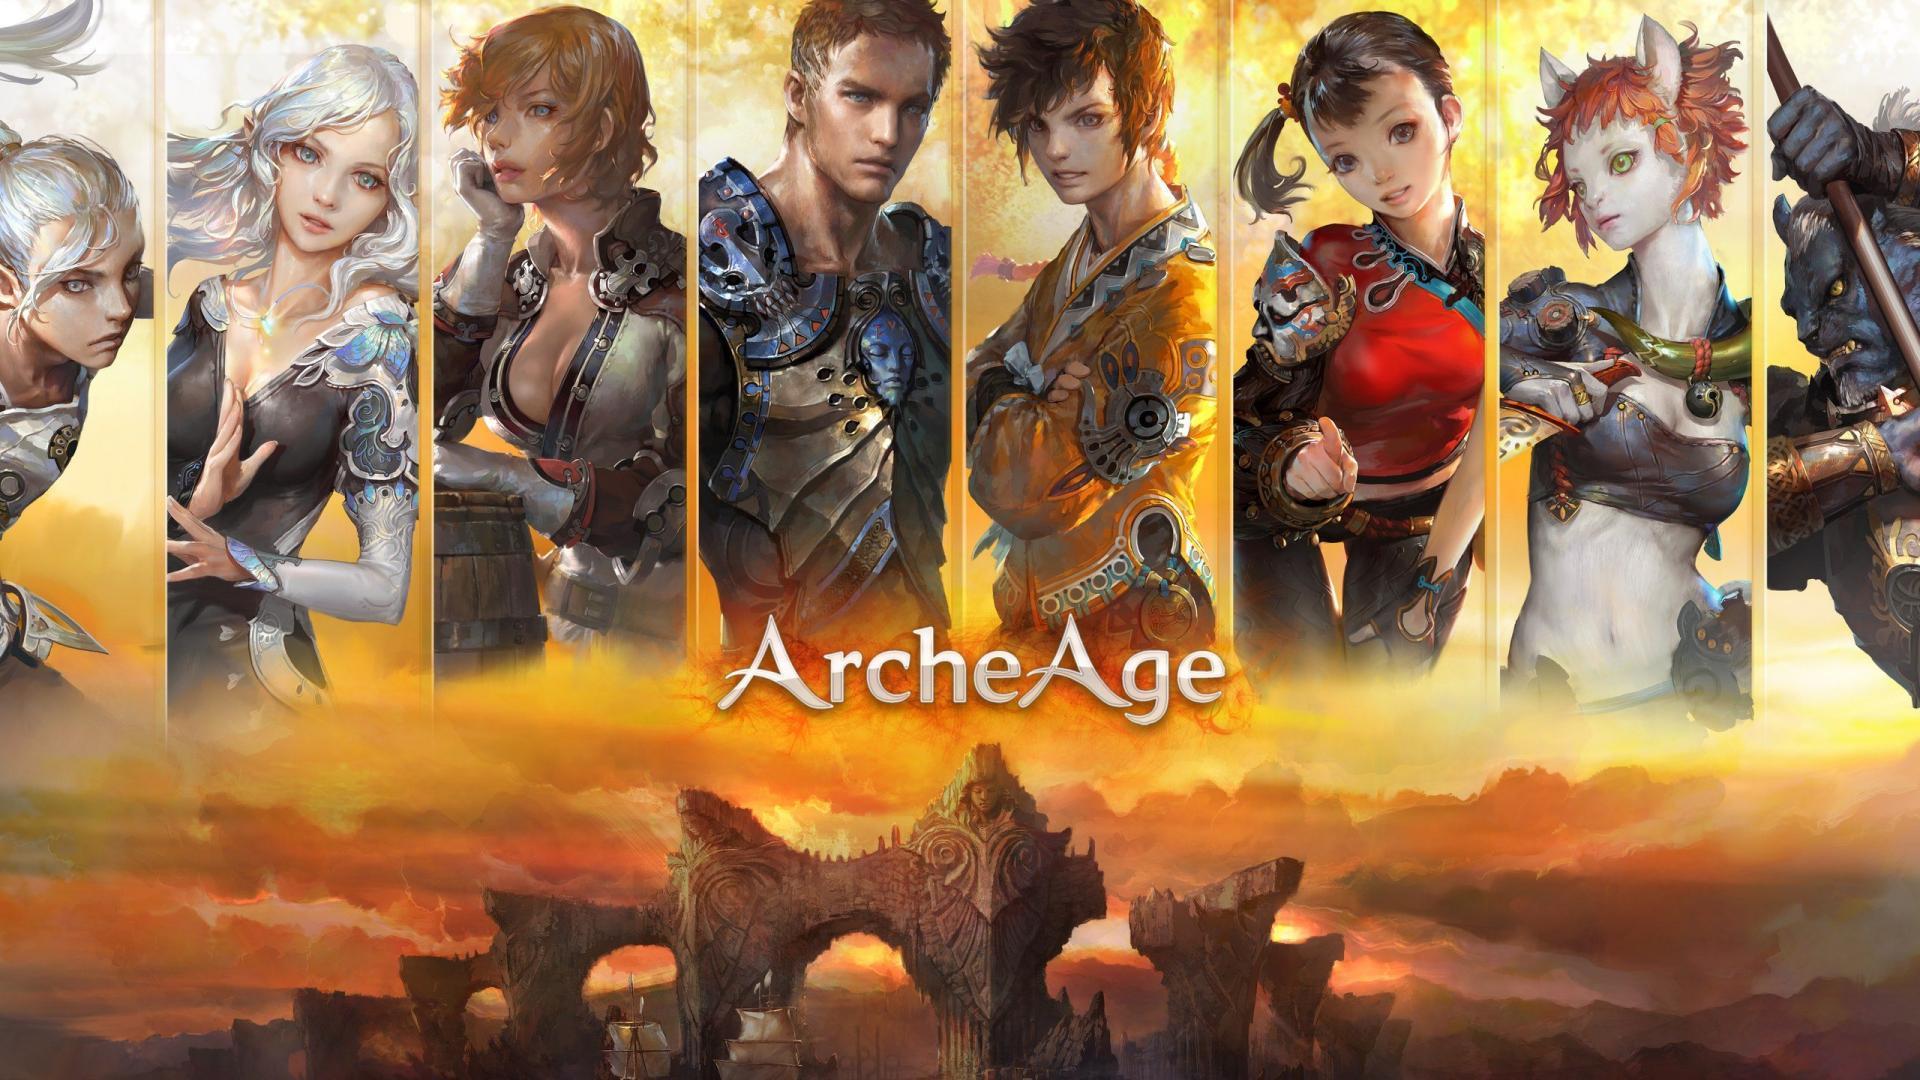 ArcheAge [KR] (2013) [Корея, клиент от 24.04.13]  ArcheAgeГод выпуска: 2013Жанр: MMORPGРазработчик: XLGAMESИздательс .... - Изображение 1